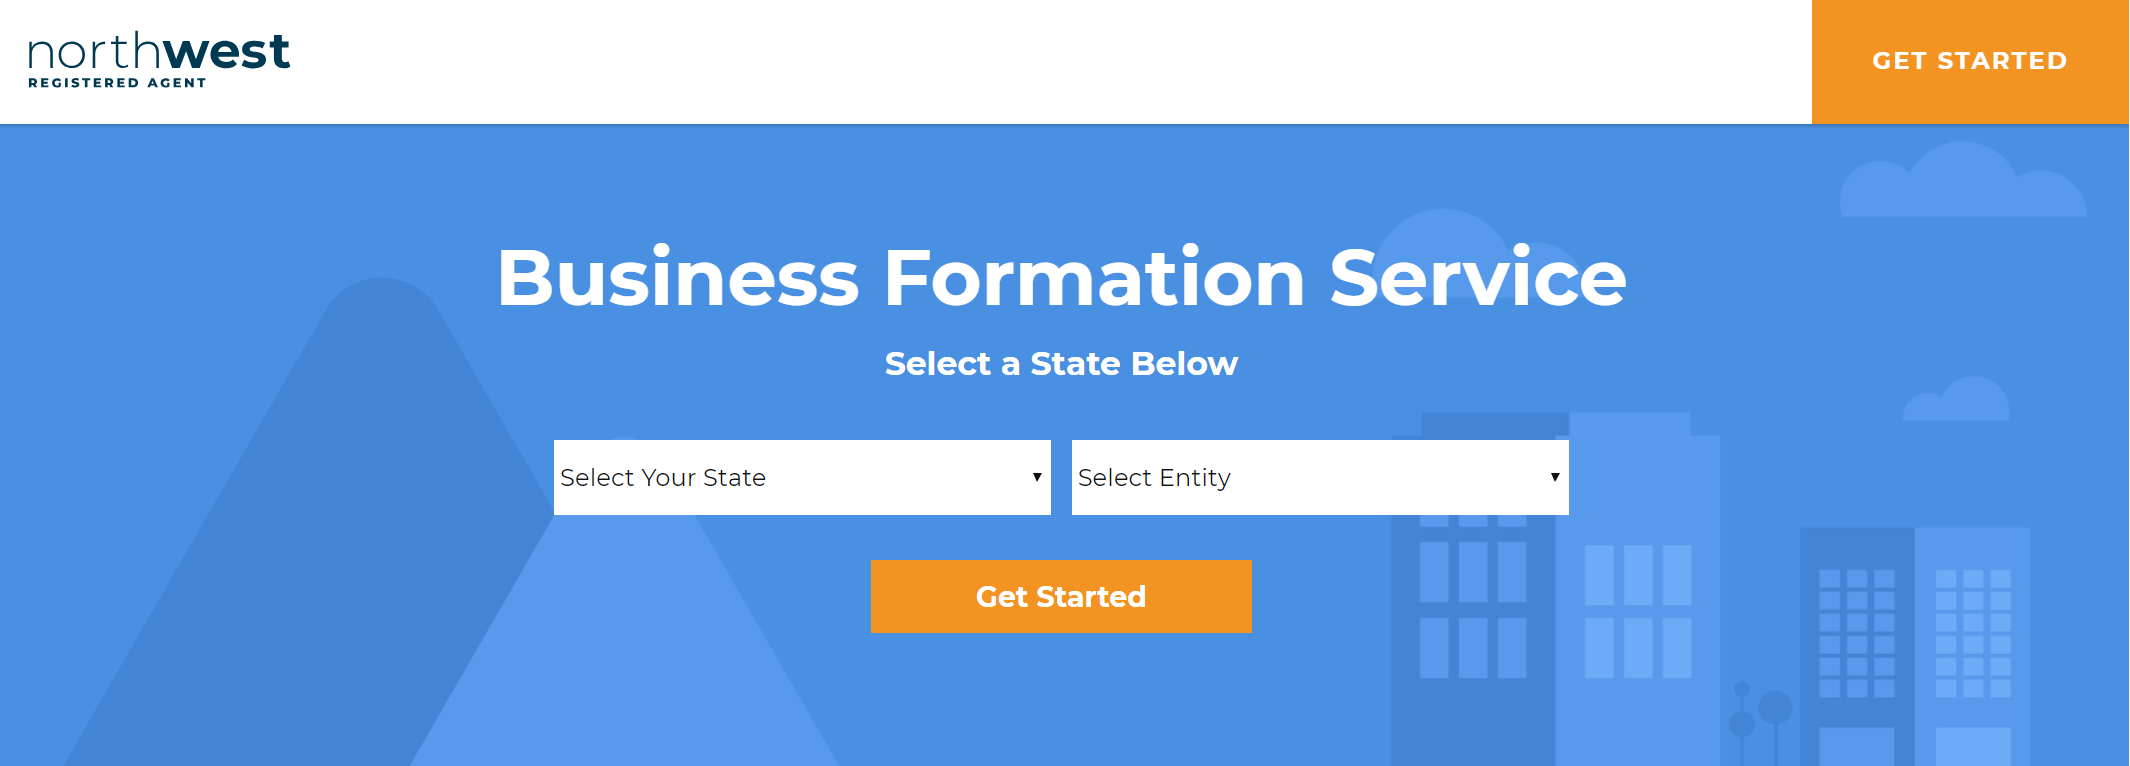 northwest-business-formation-service